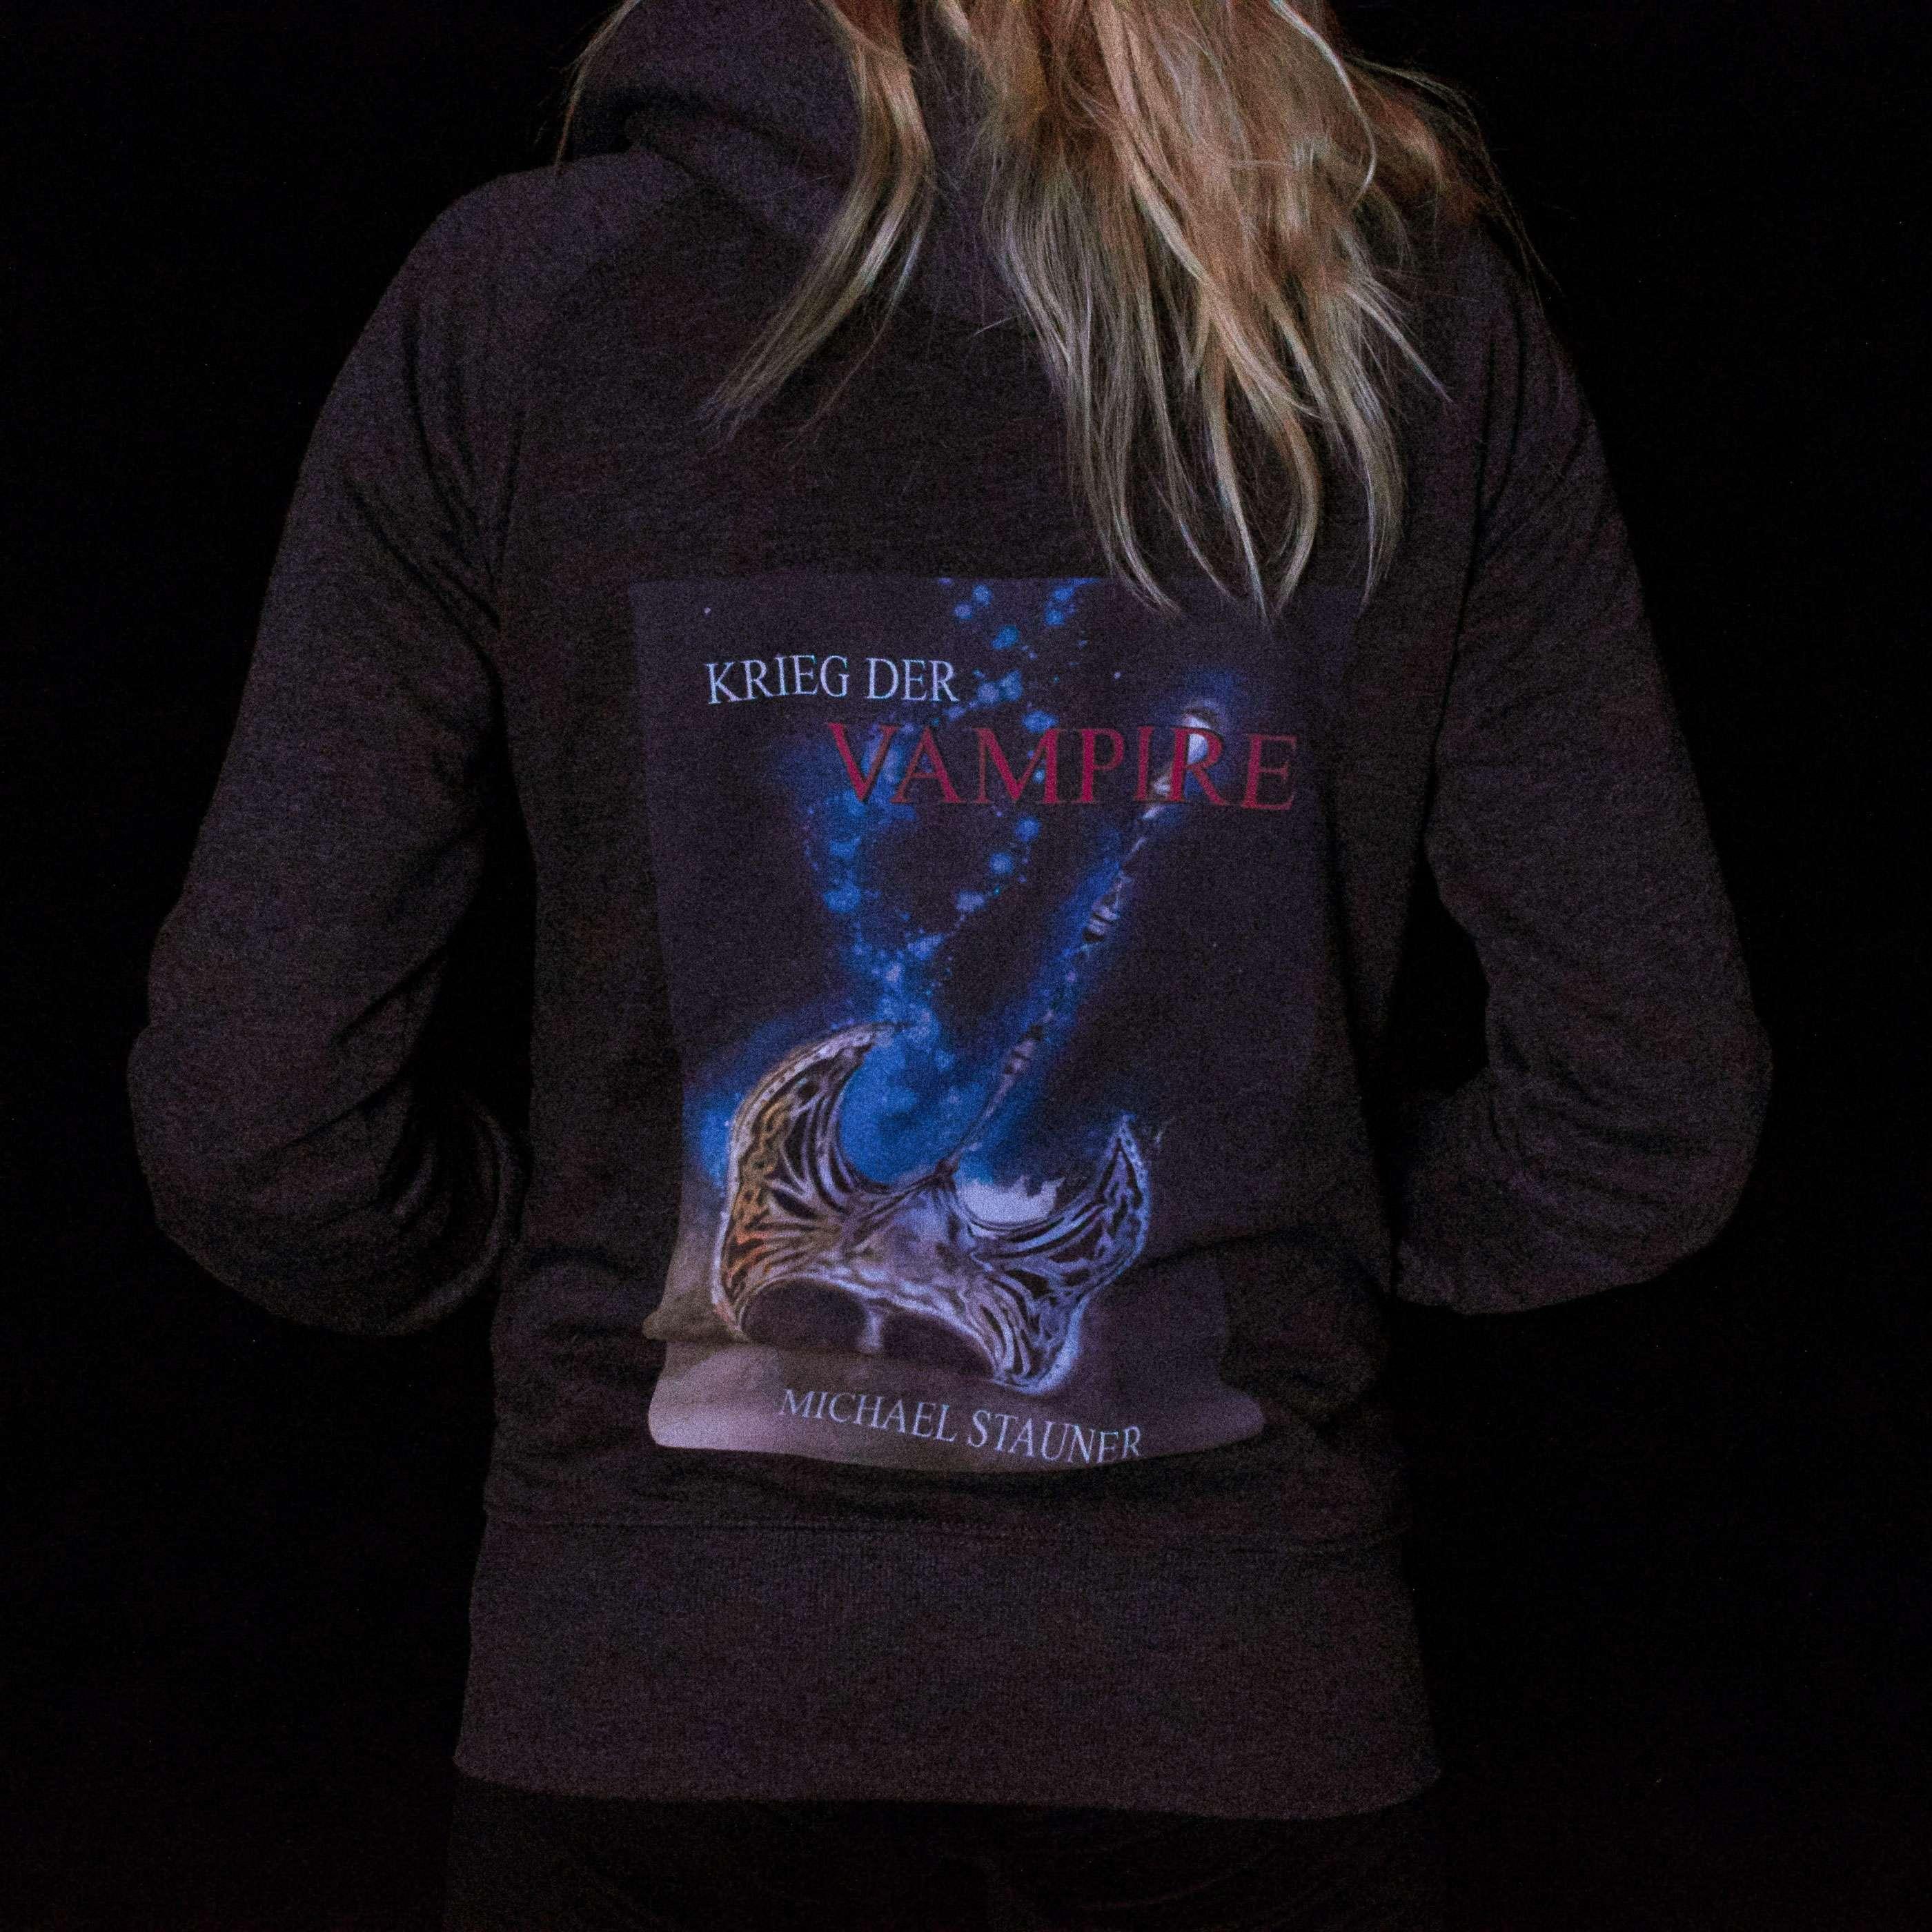 michael-stauner-merchandise-krieg-der-vampire-hoodie-girl.jpg